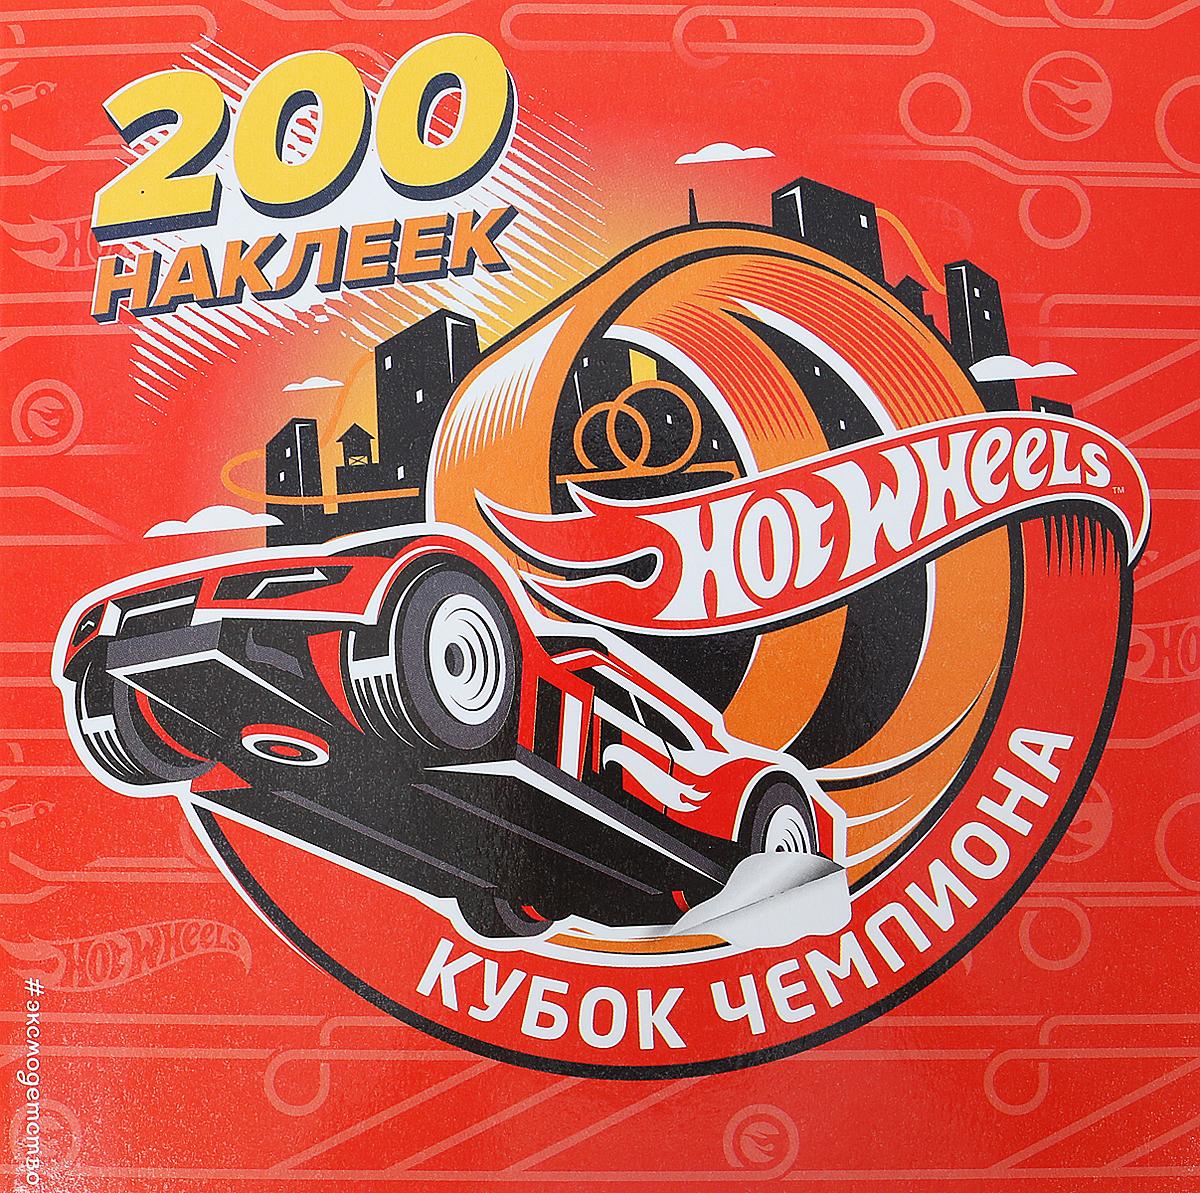 Кубок Чемпиона. 200 супернаклеек жми на газ